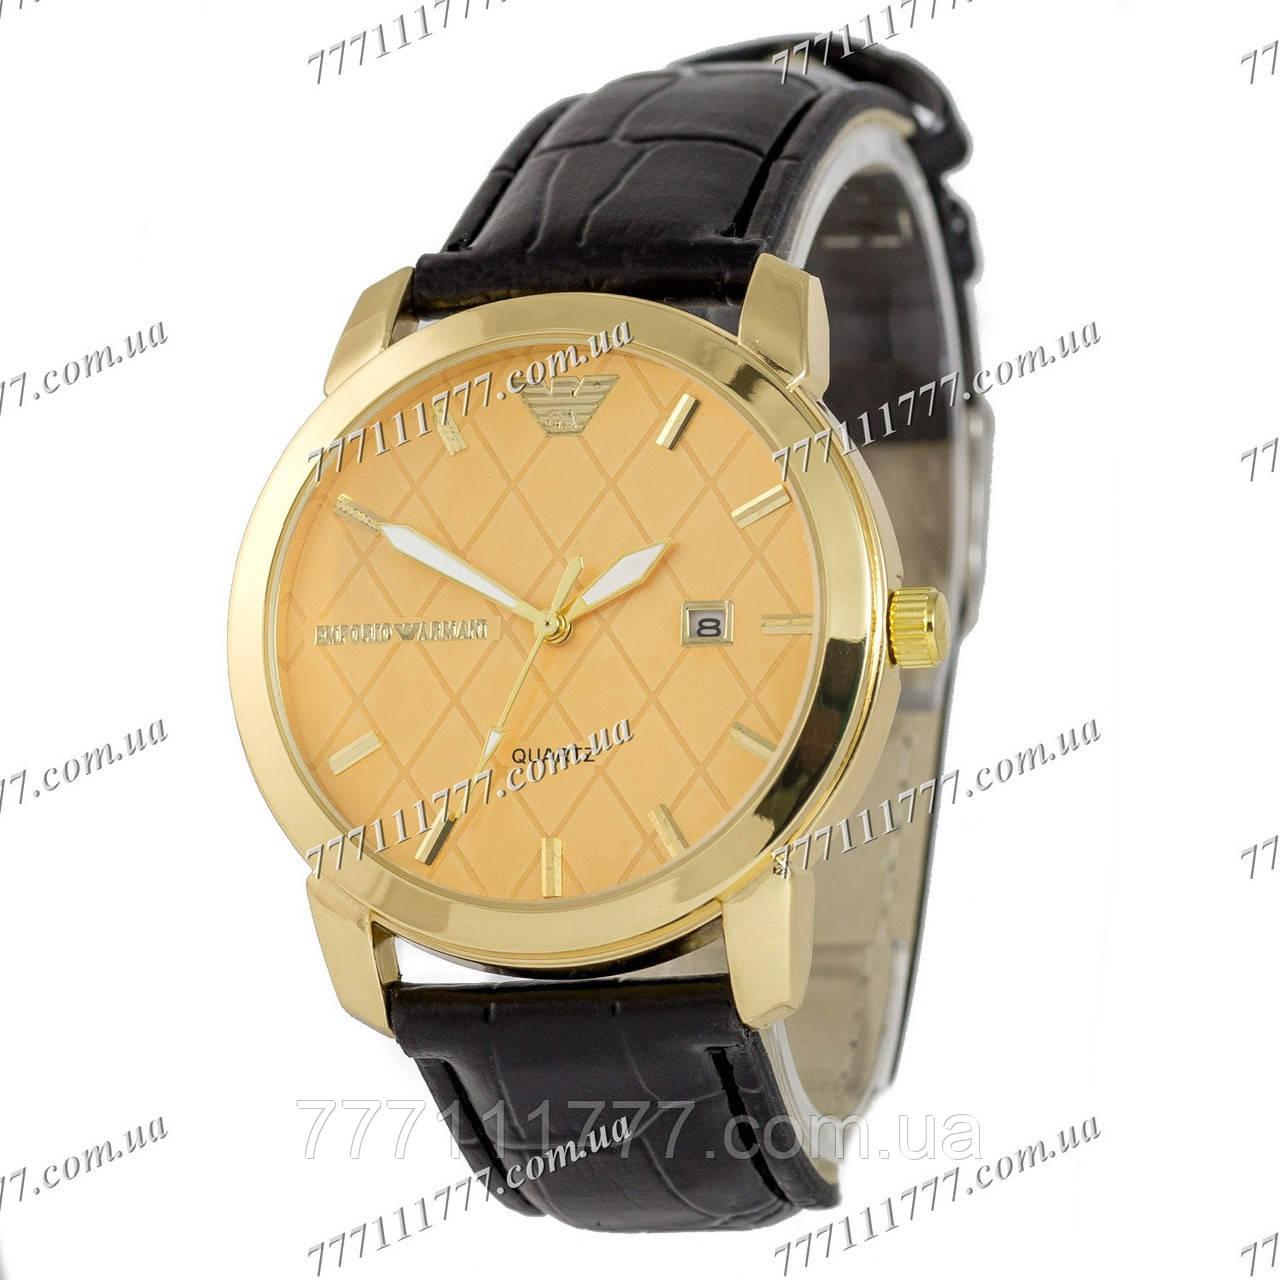 cfa8a5a2 Часы мужские наручные Armani Quartz B65 Black/Gold/Gold: продажа ...